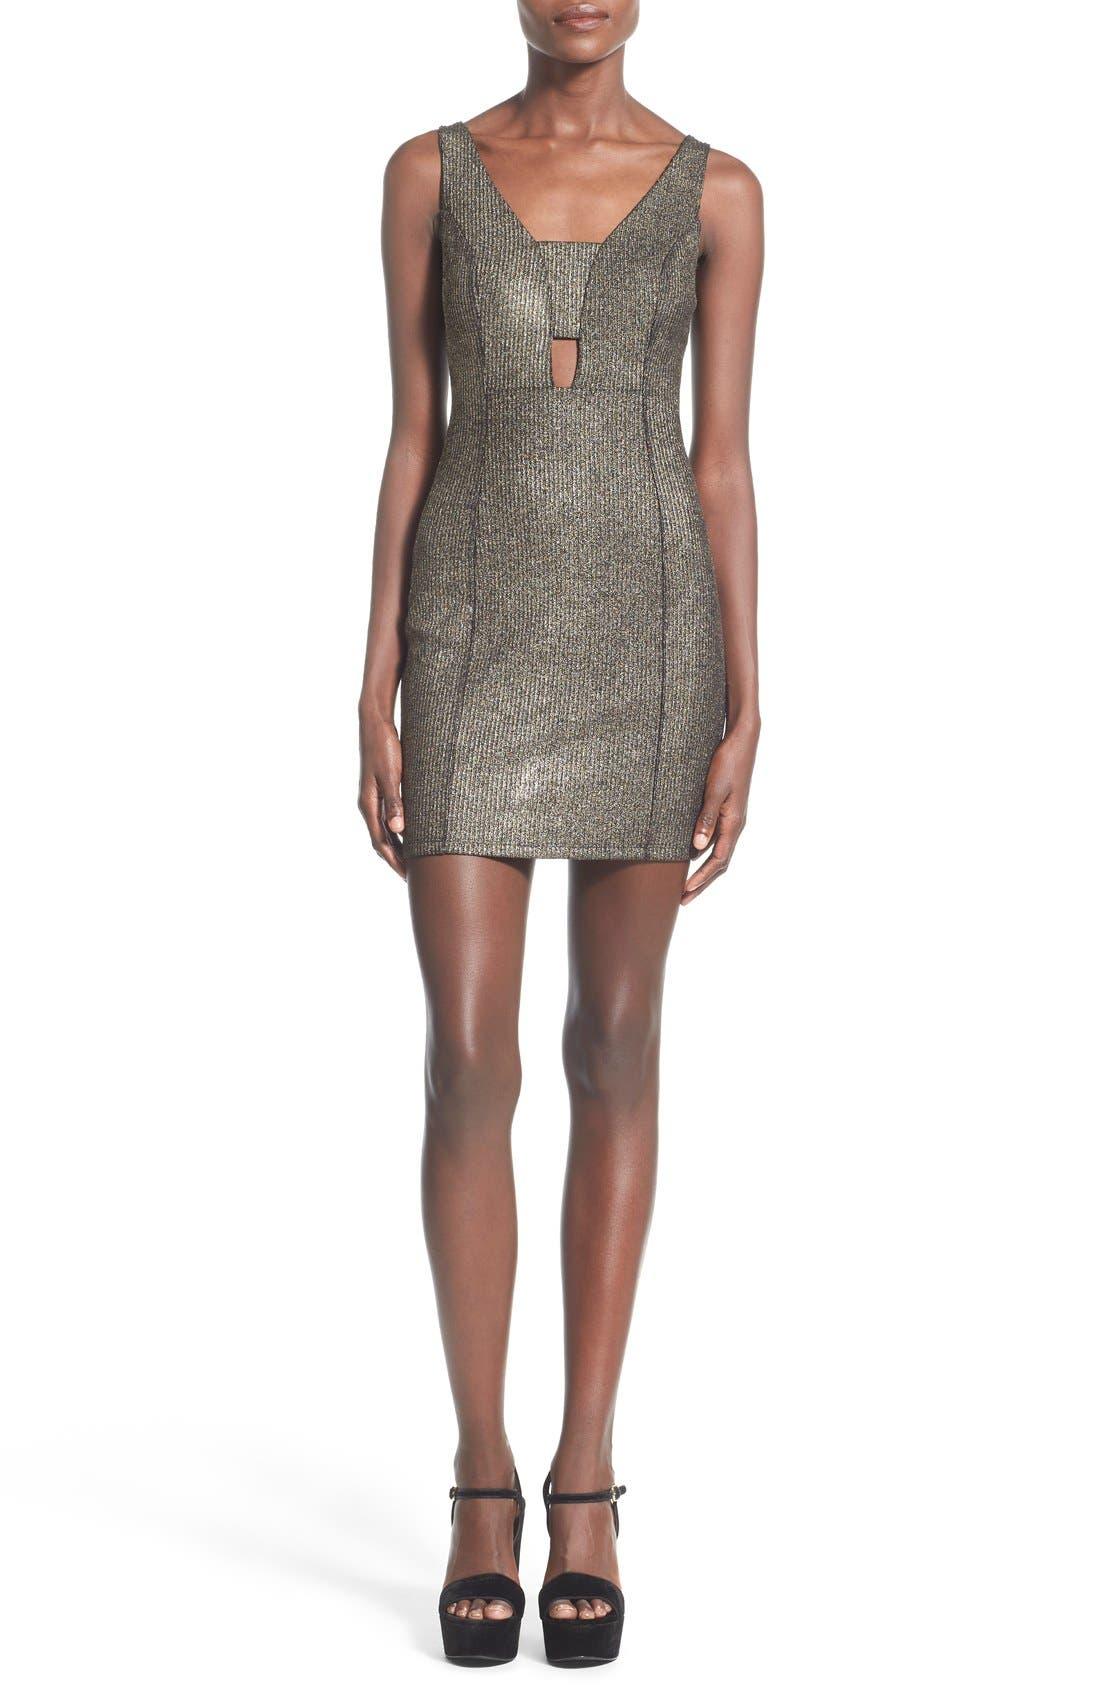 Alternate Image 1 Selected - Soprano Cutout Detail Metallic Body-Con Dress